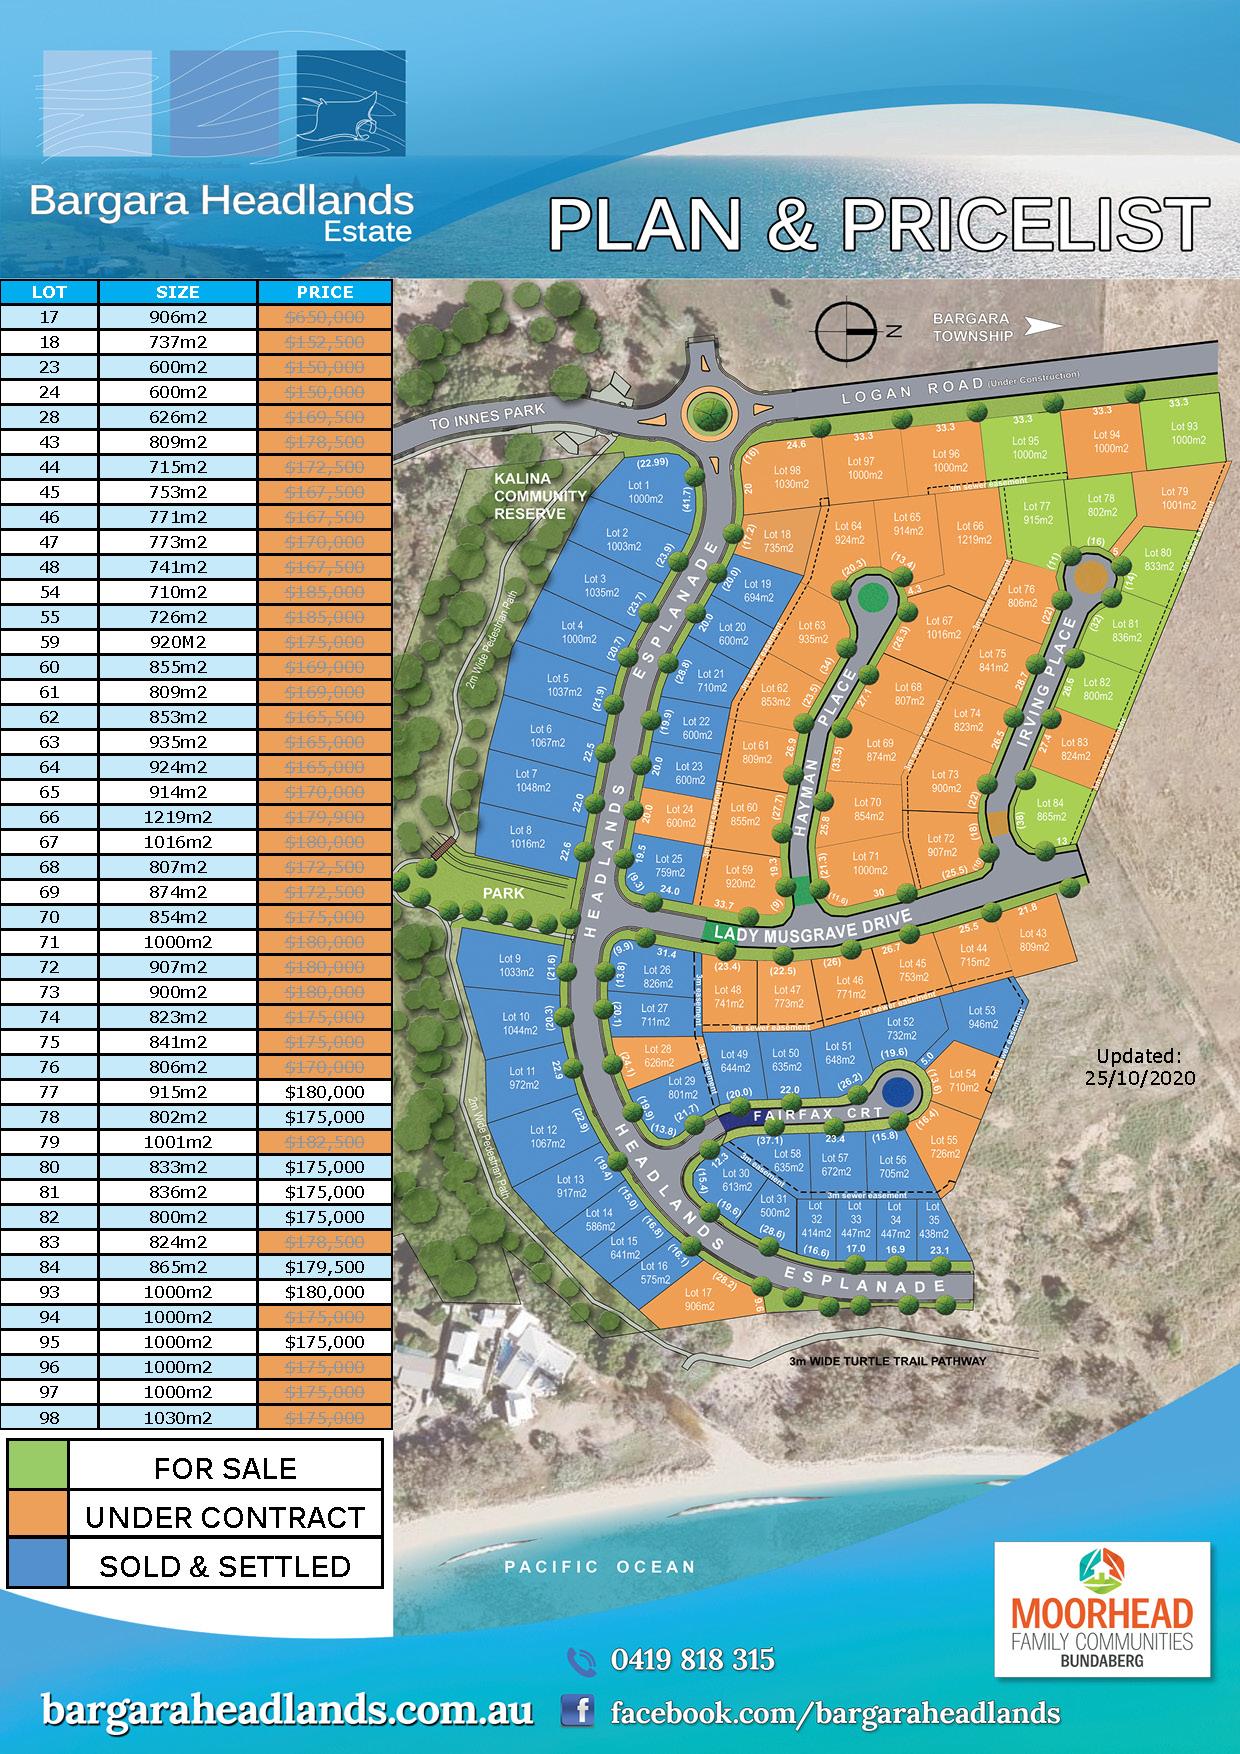 Plan and Price List - 25th October 2020 - Bargara Headlands Estate